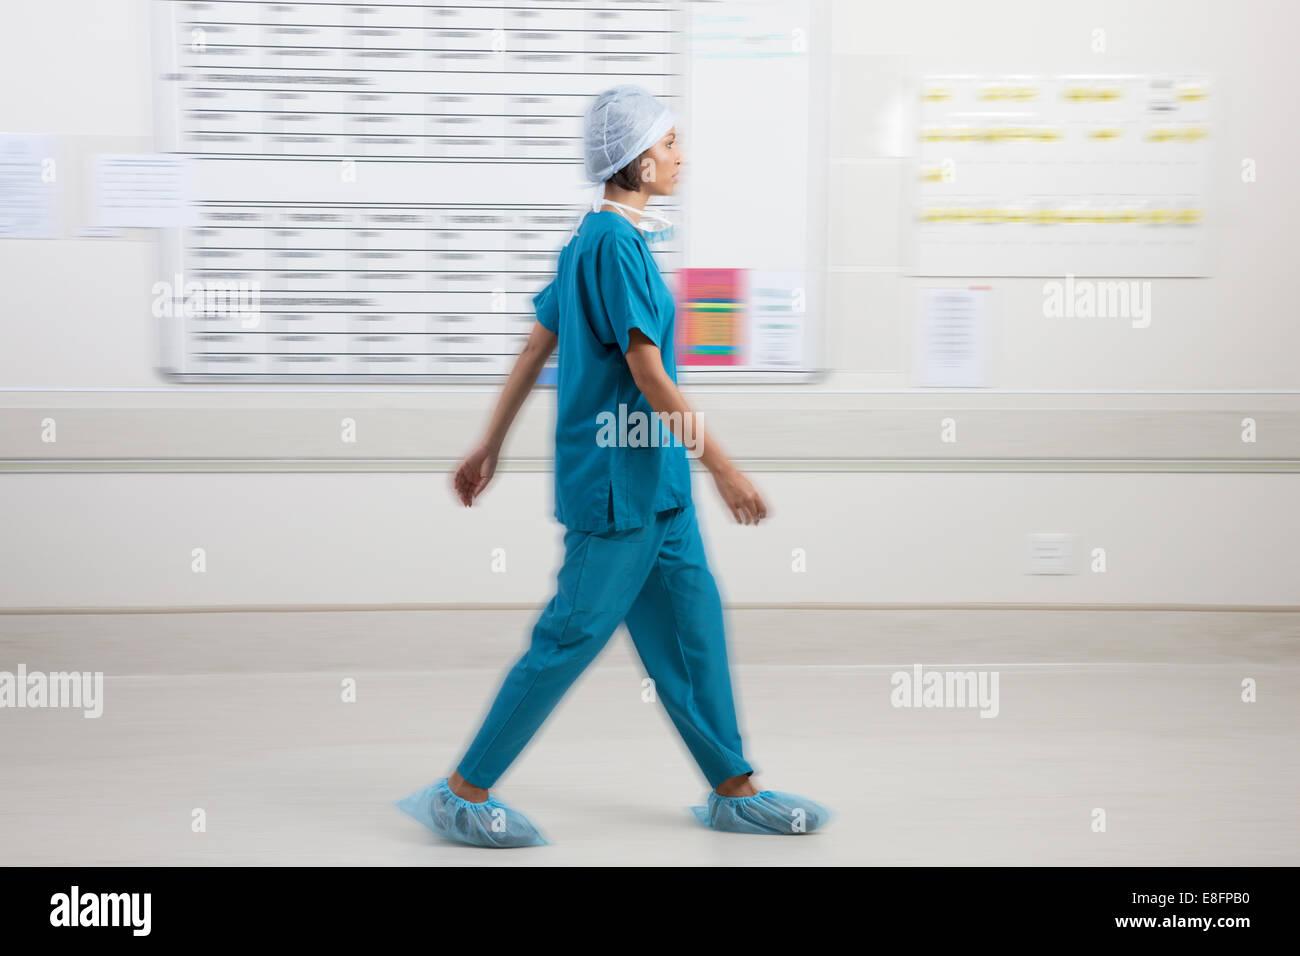 Chirurg, vorbei an Zeitplan Board im Krankenhaus Stockbild